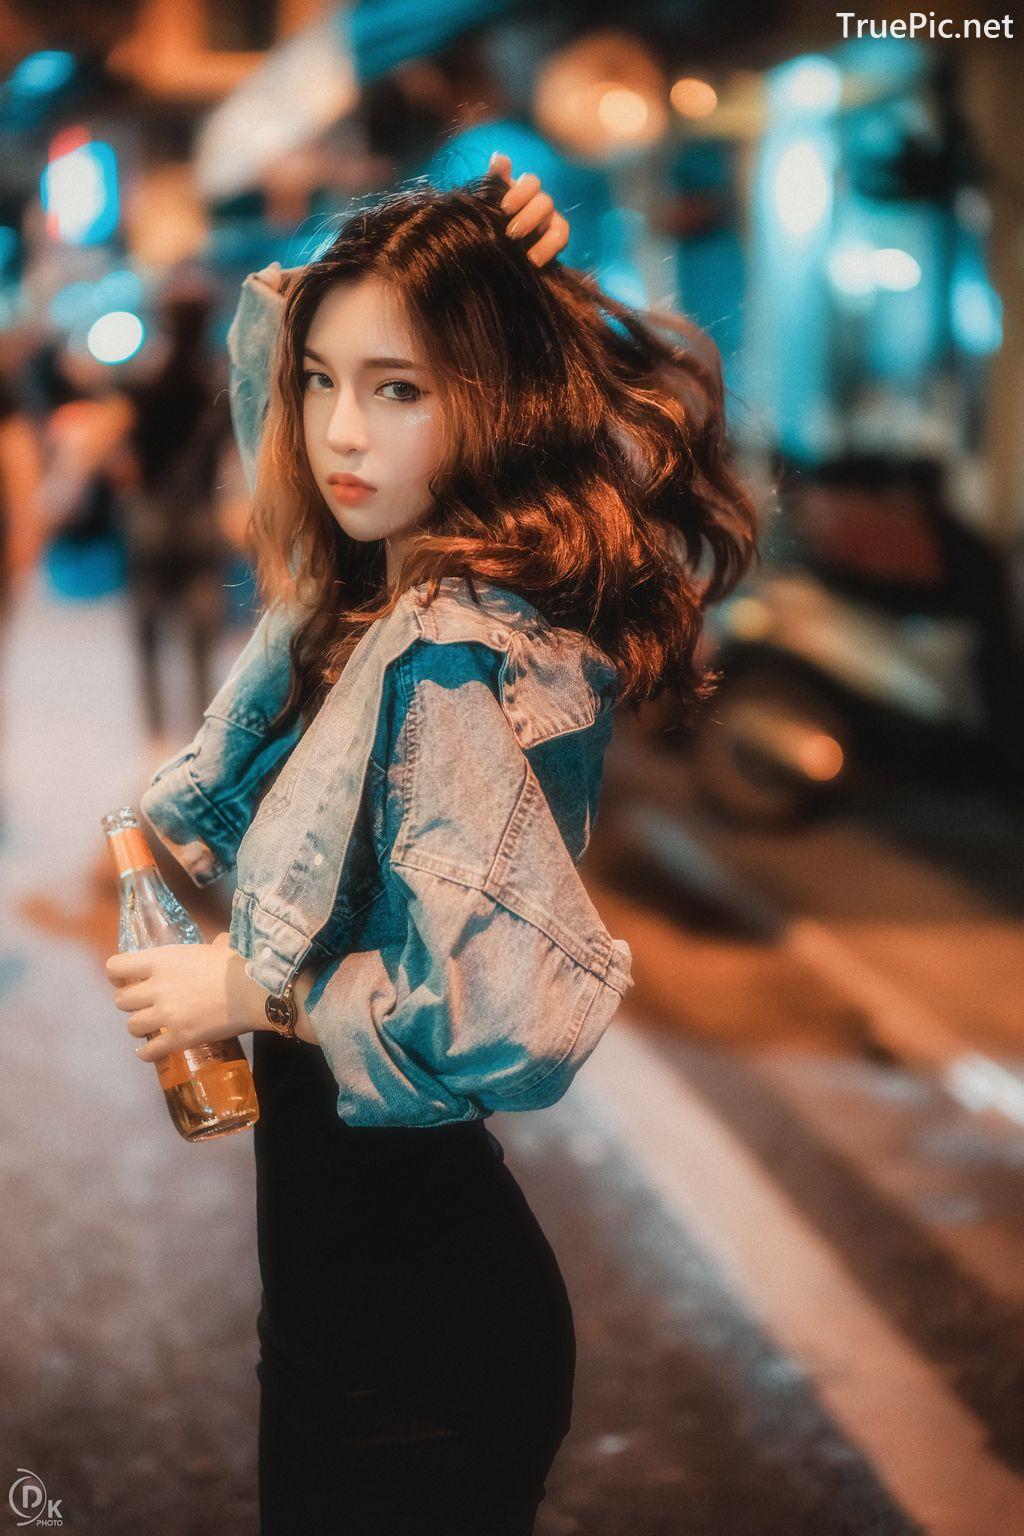 Image Vietnamese Model - Let's Get Drunk Tonight - TruePic.net - Picture-5